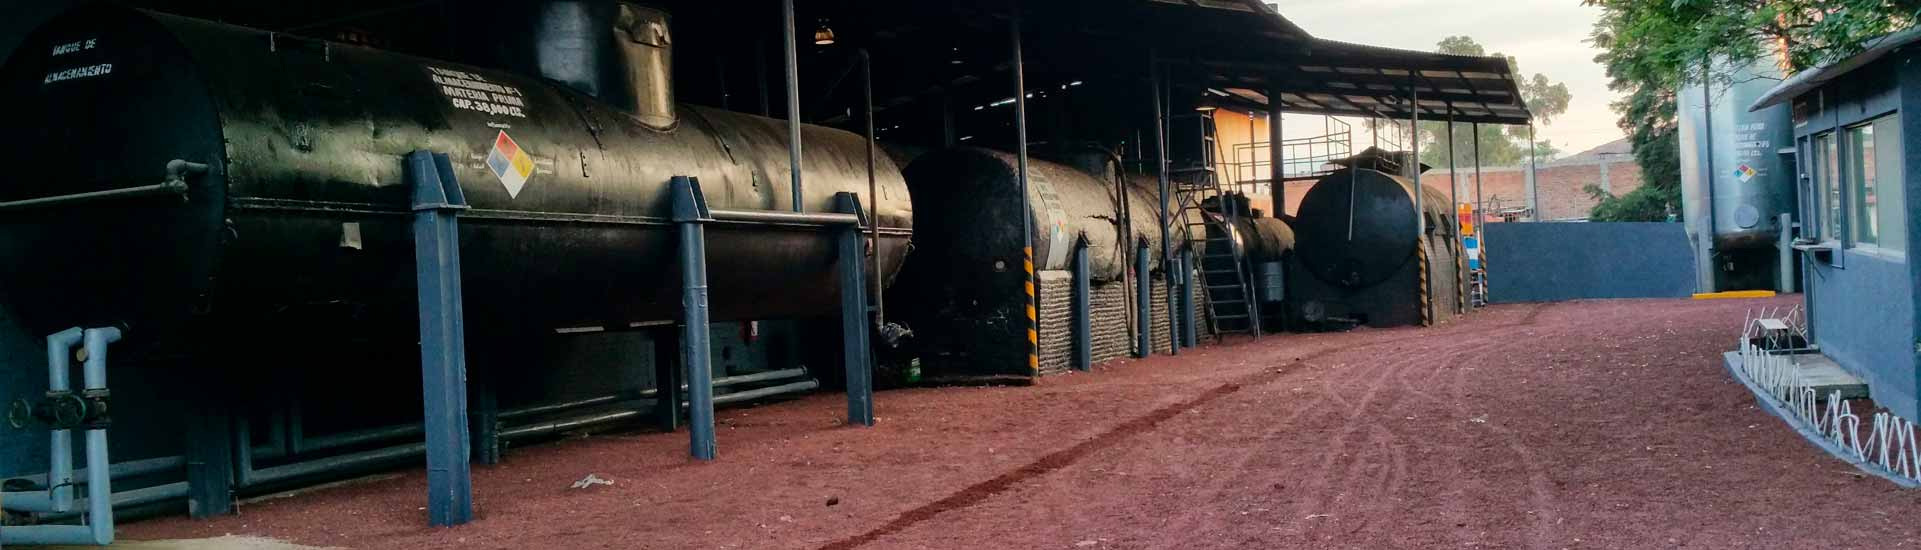 Elaboramos cualquier contra tipo de asfalto para uso industrial e impermeabilización.